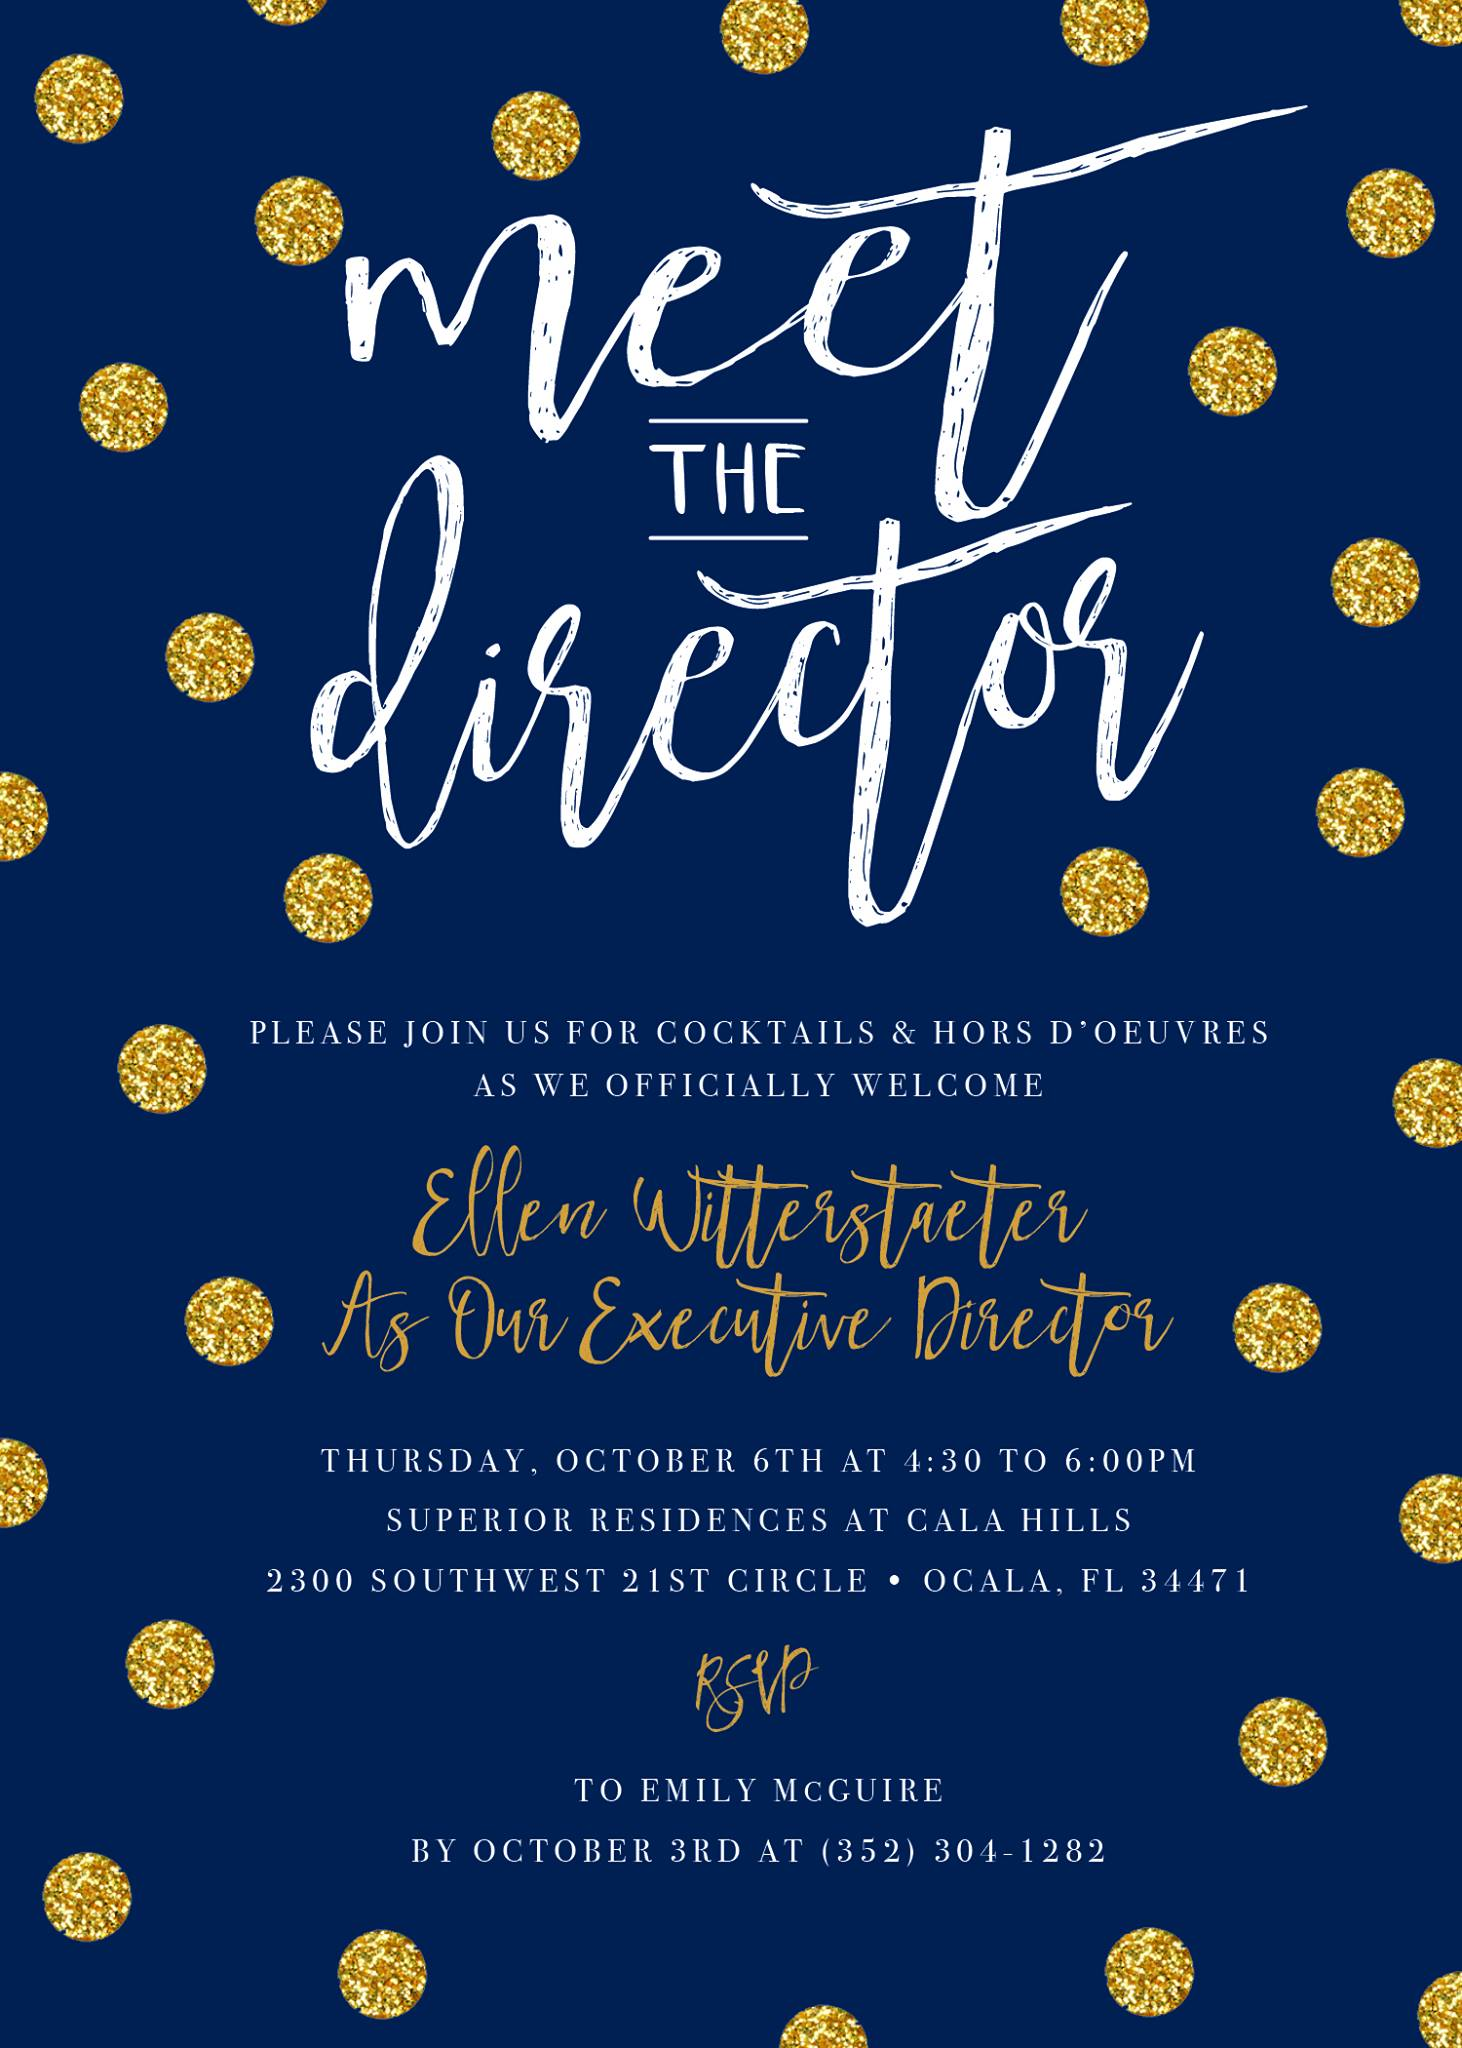 Meet The Director At Superior Residences At Cala Hills Ocala